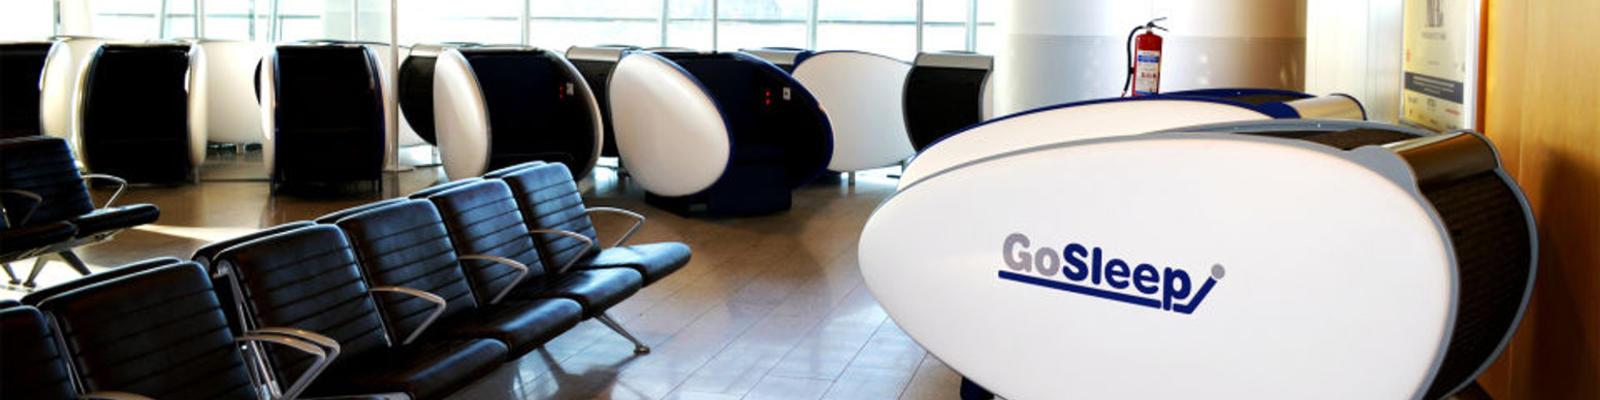 Sleep pod at Helsinki Airport